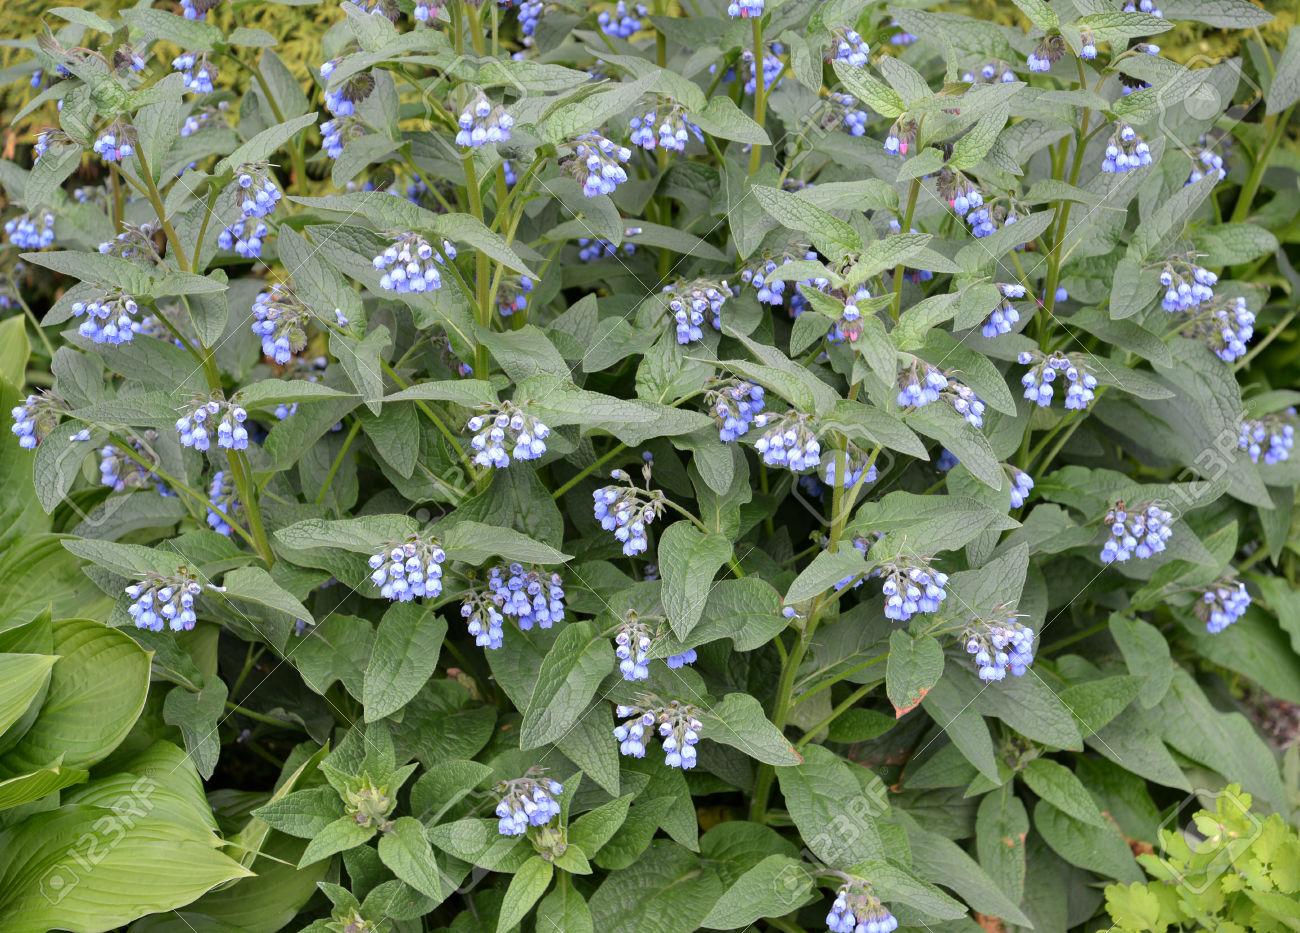 Blossoming Of A Comfrey Caucasian (Symphytum Caucasicum M. Bieb.